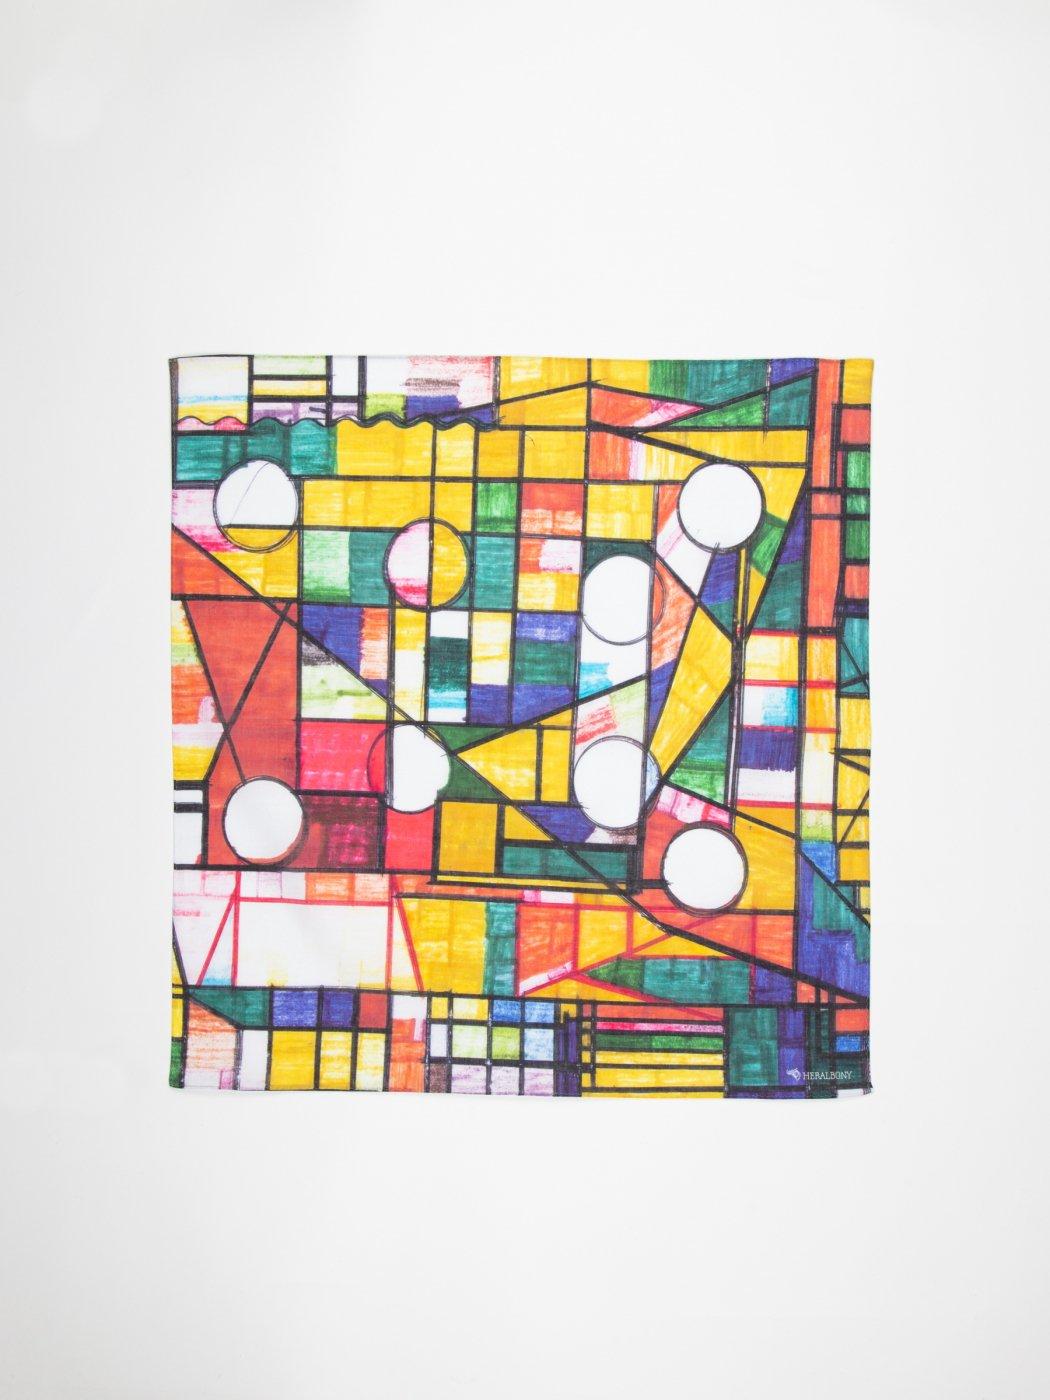 HERALBONY -ART HANDKERCHIEF-Kiyoshi Yaegashi-NO TITLE(HOUSE)-YELLOW-